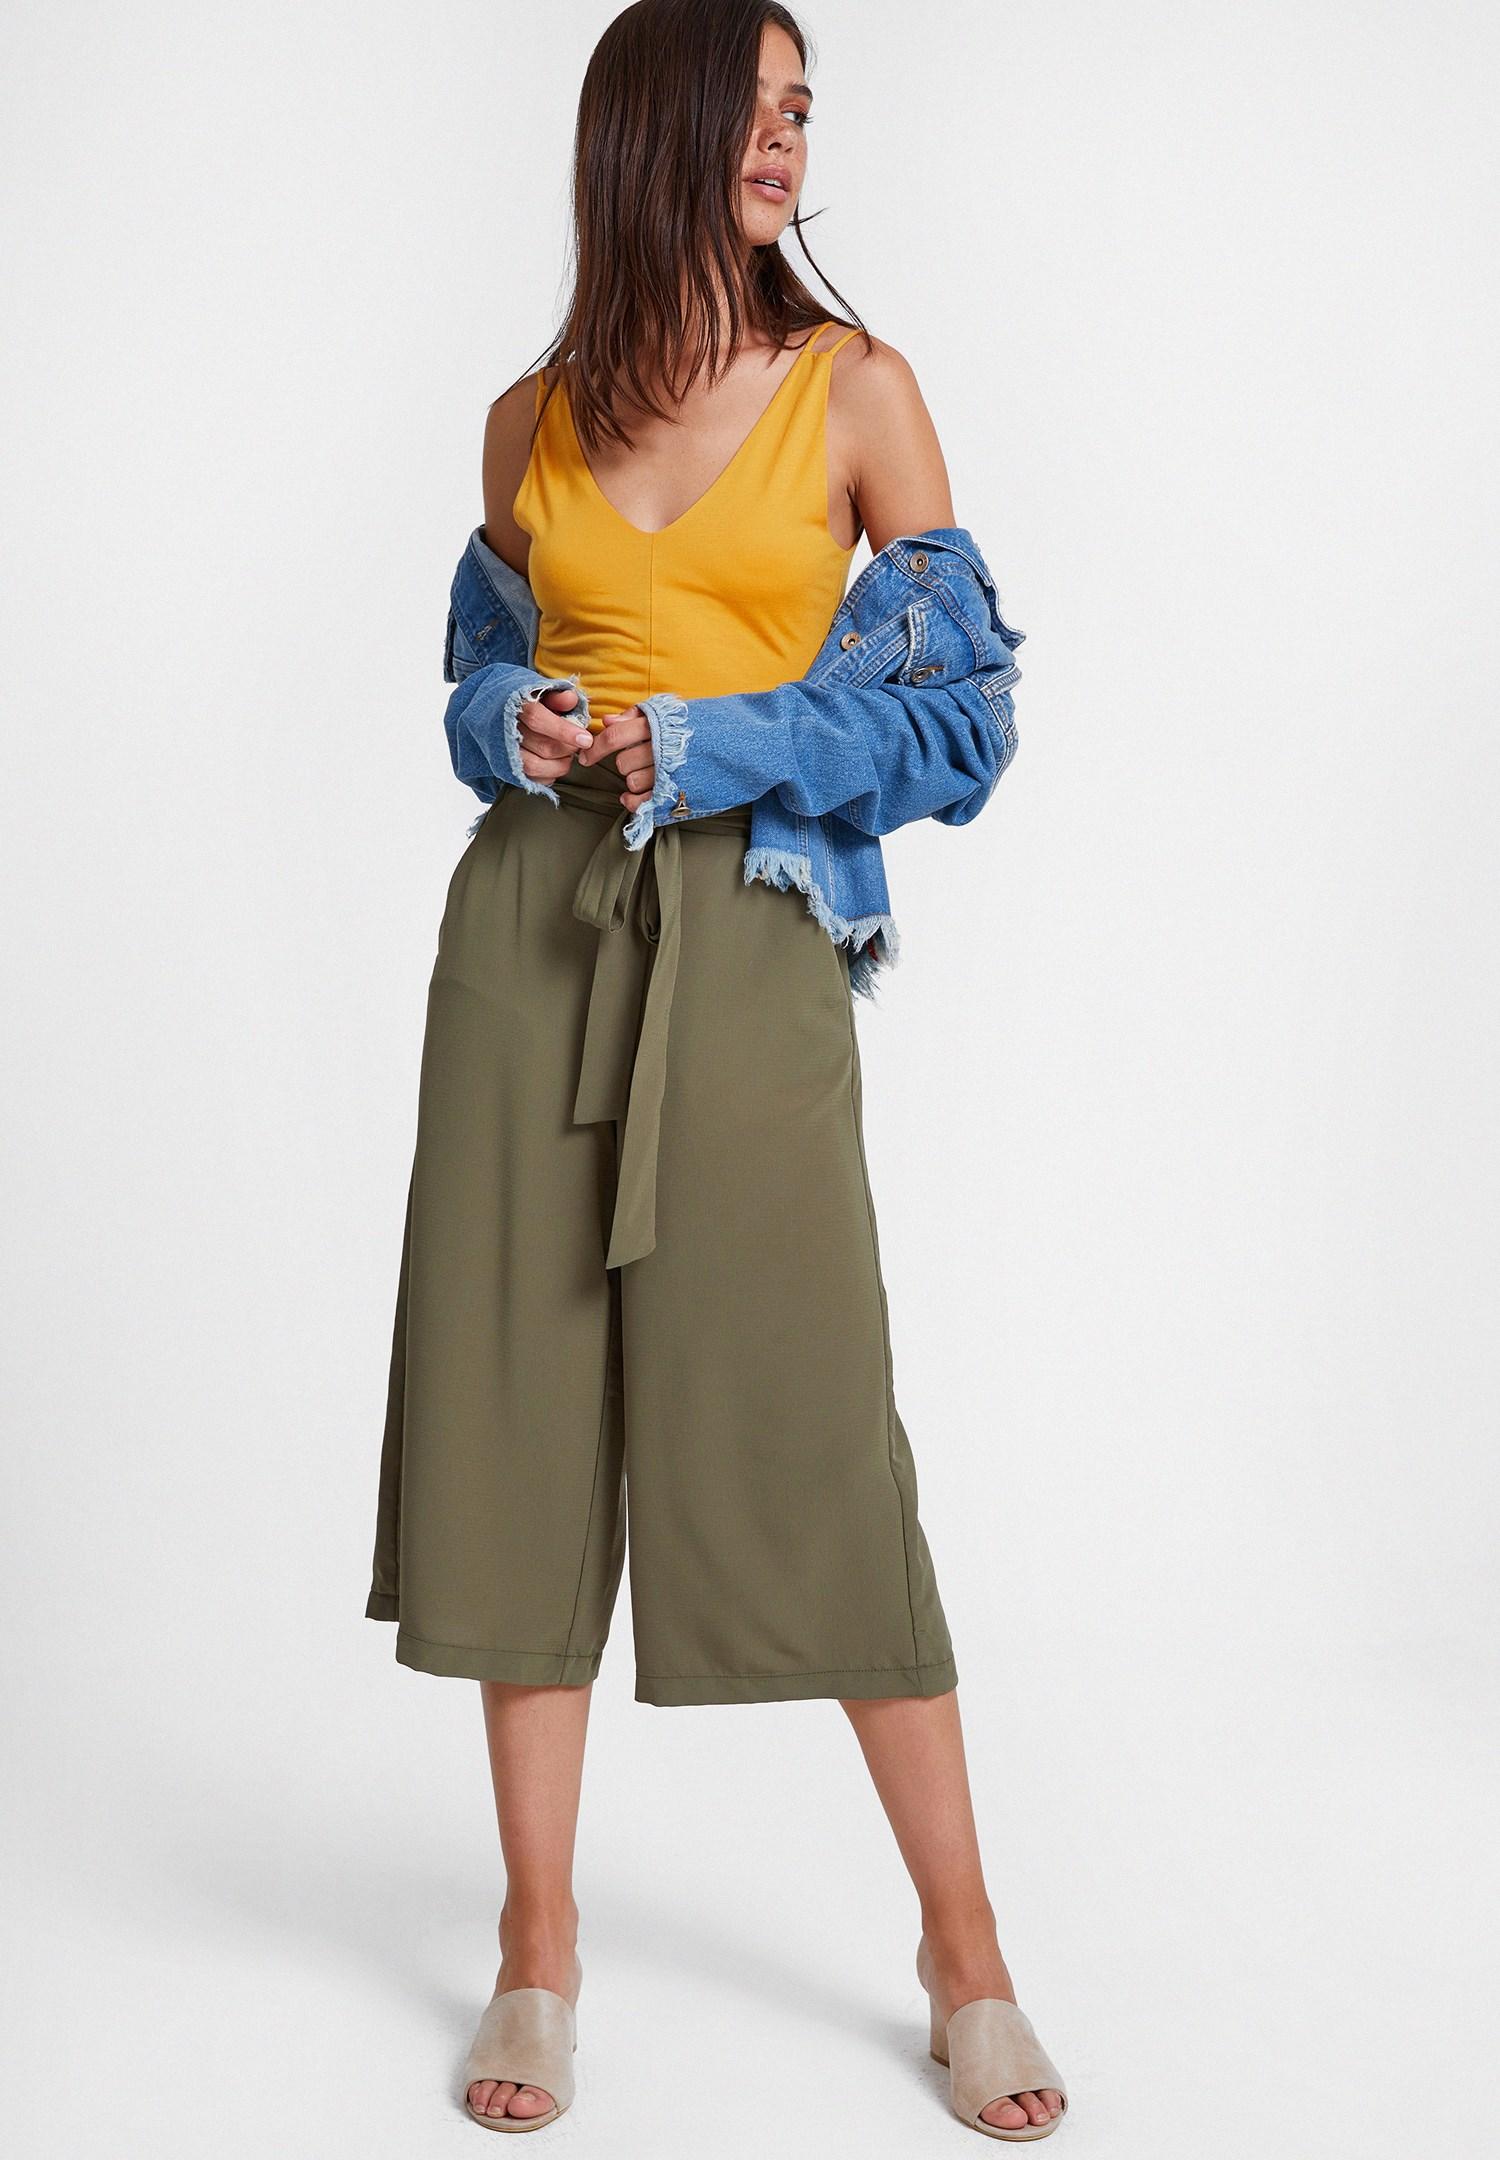 Bayan Turuncu Çift Askılı V Yaka Bluz